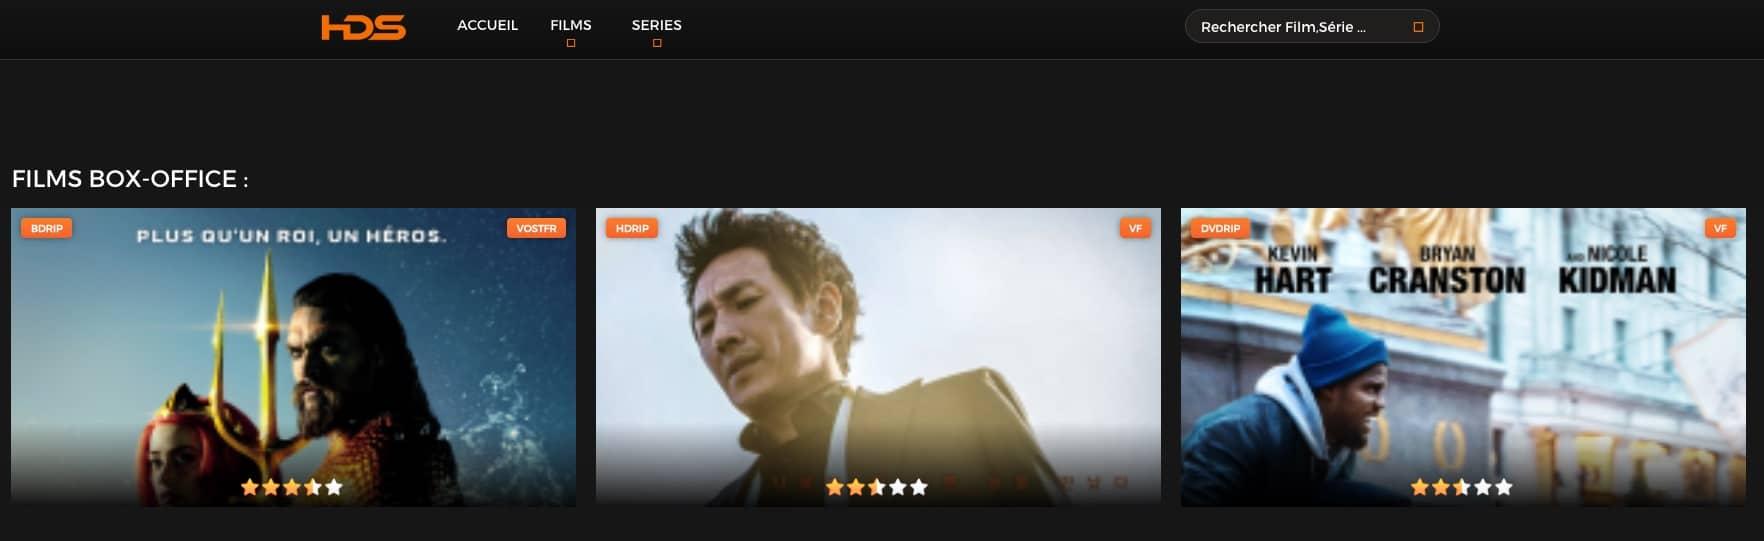 HDSS Streaming gratuit Films complet en VT et VOST